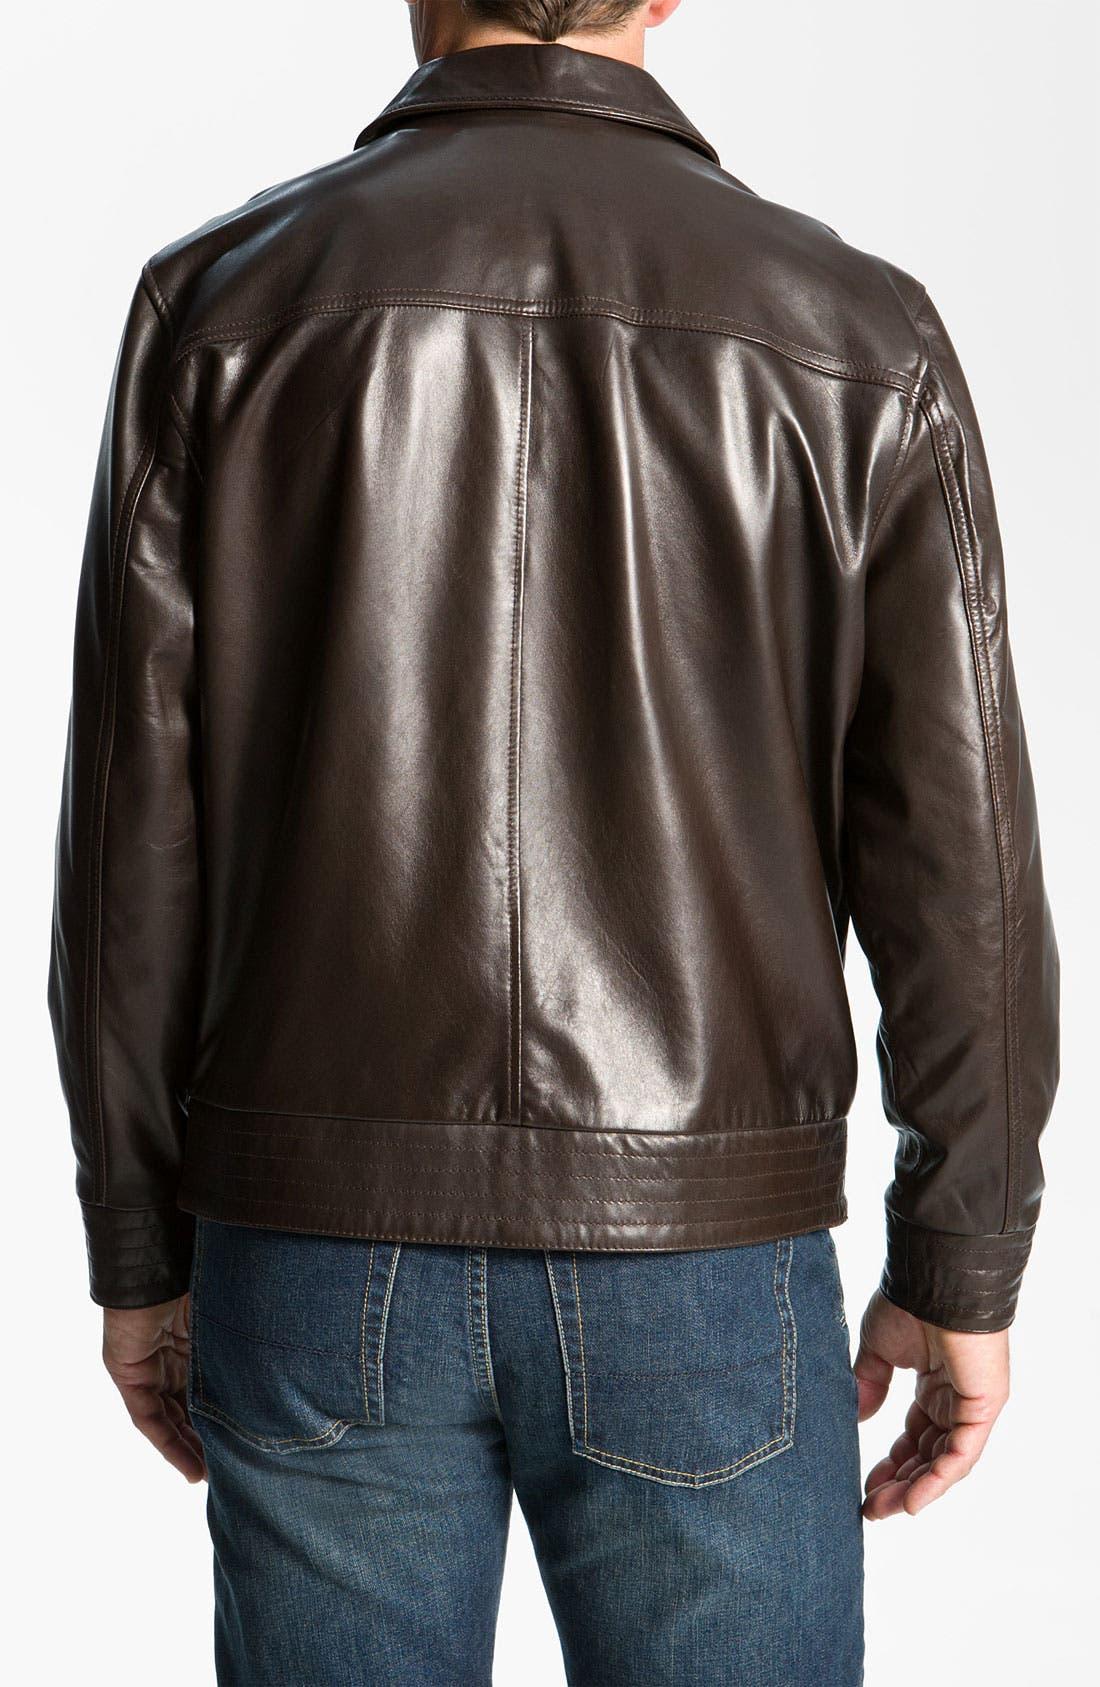 Alternate Image 2  - Cutter & Buck 'Wildridge' Leather Bomber Jacket (Big & Tall)